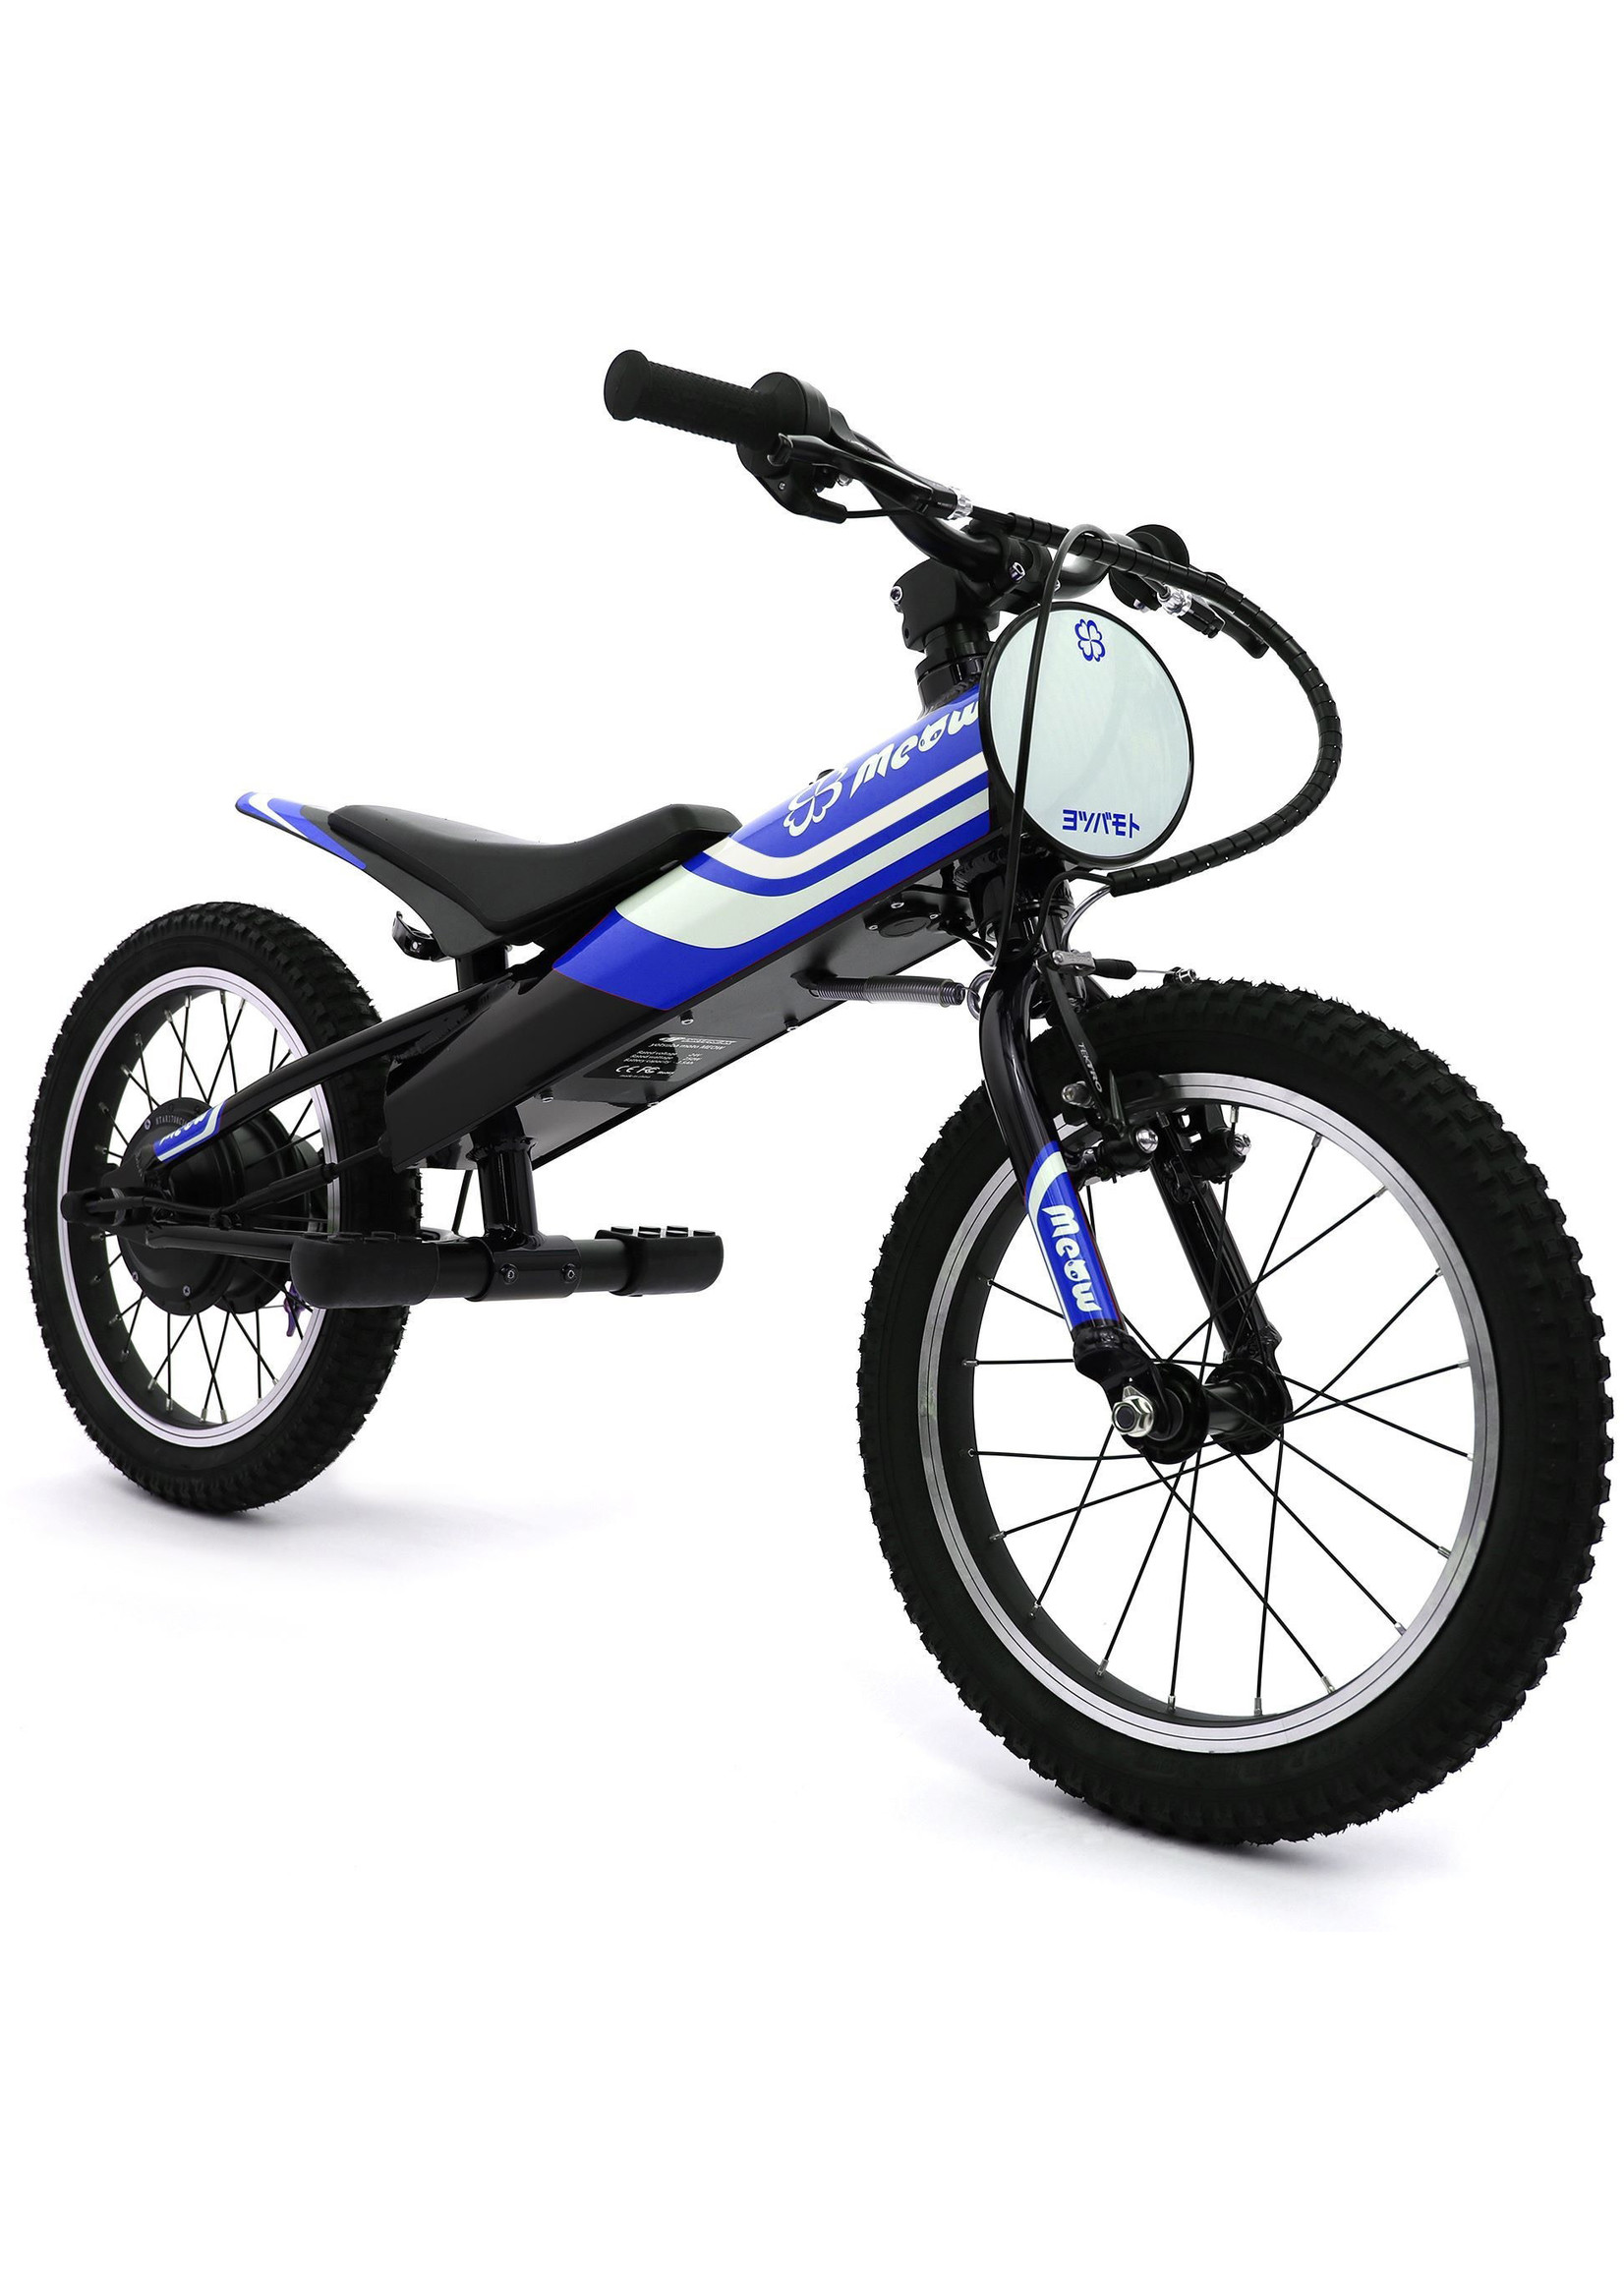 "DRC Yotsuba 16"" Electric Bike Black w Red/Blue Decal"